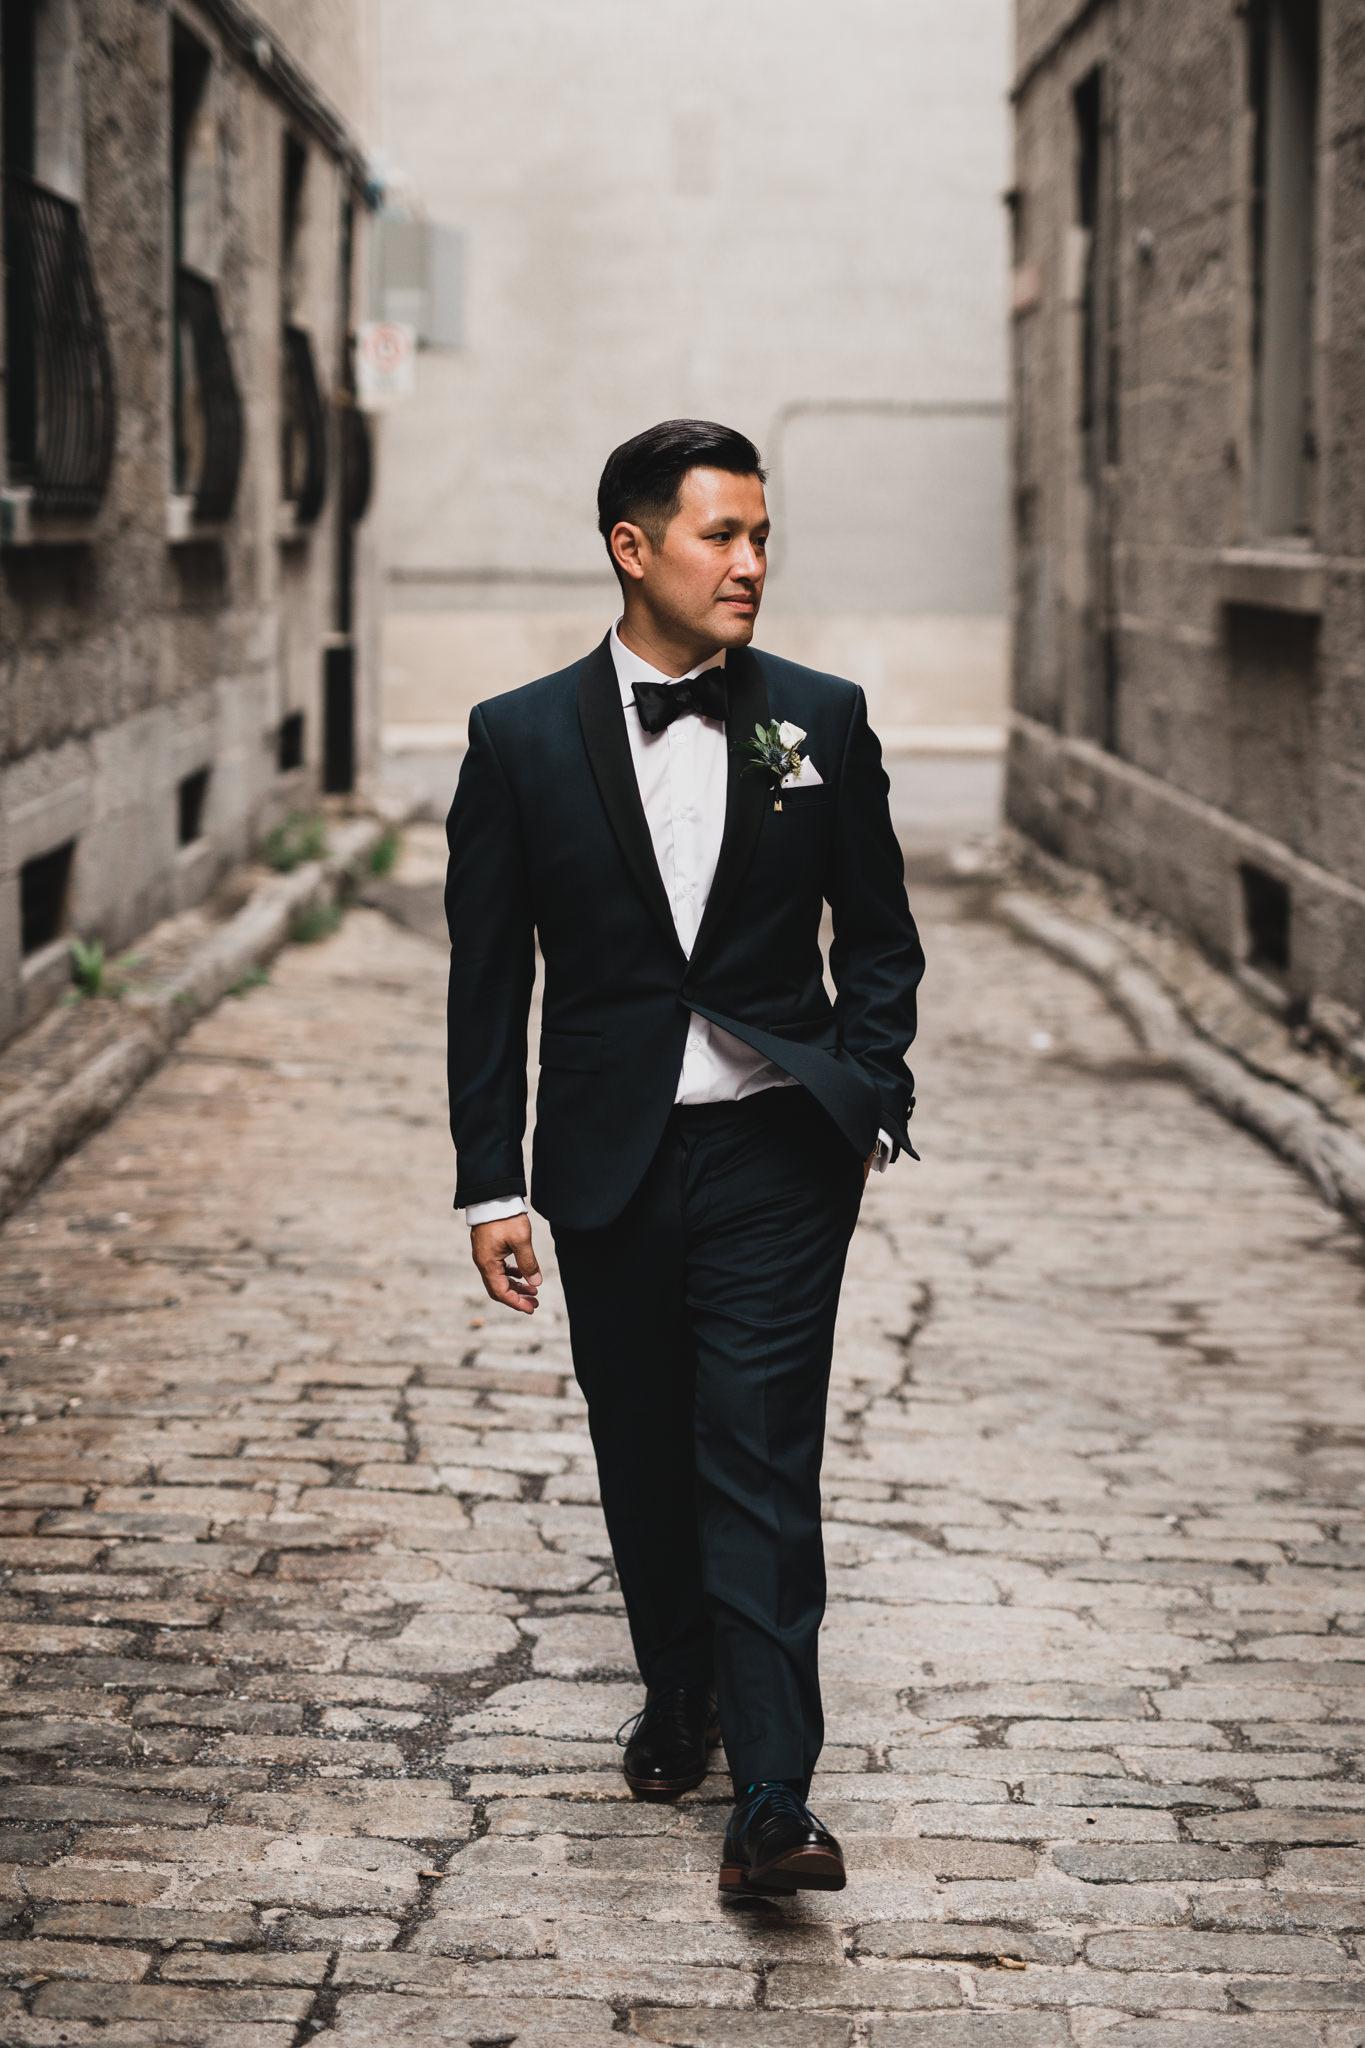 Classy groomsmen portrait